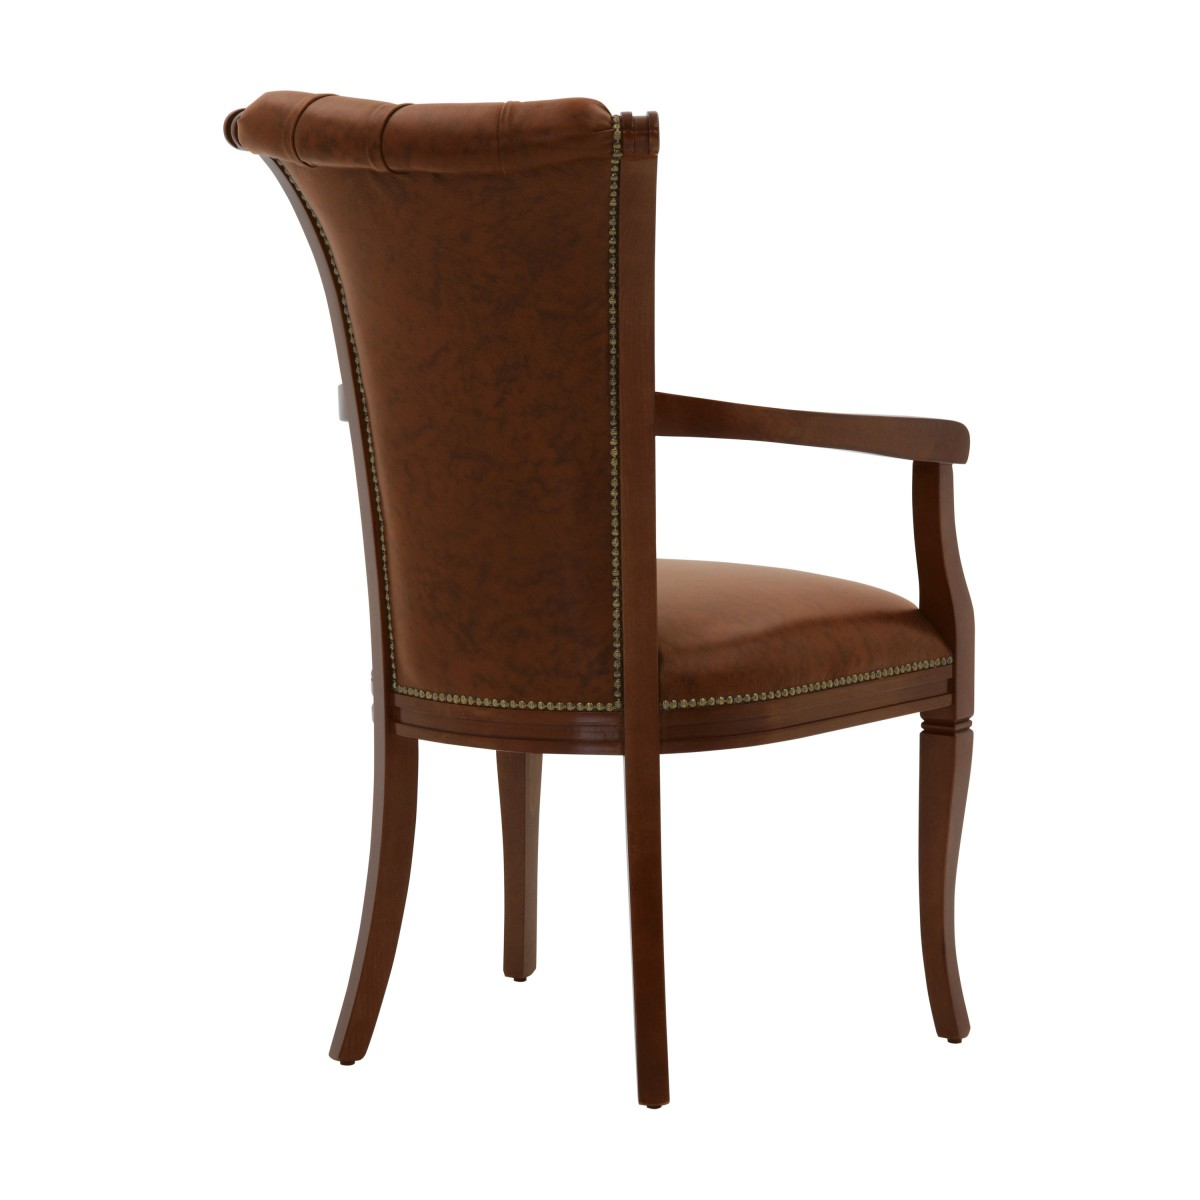 Small armchair York - Sevensedie